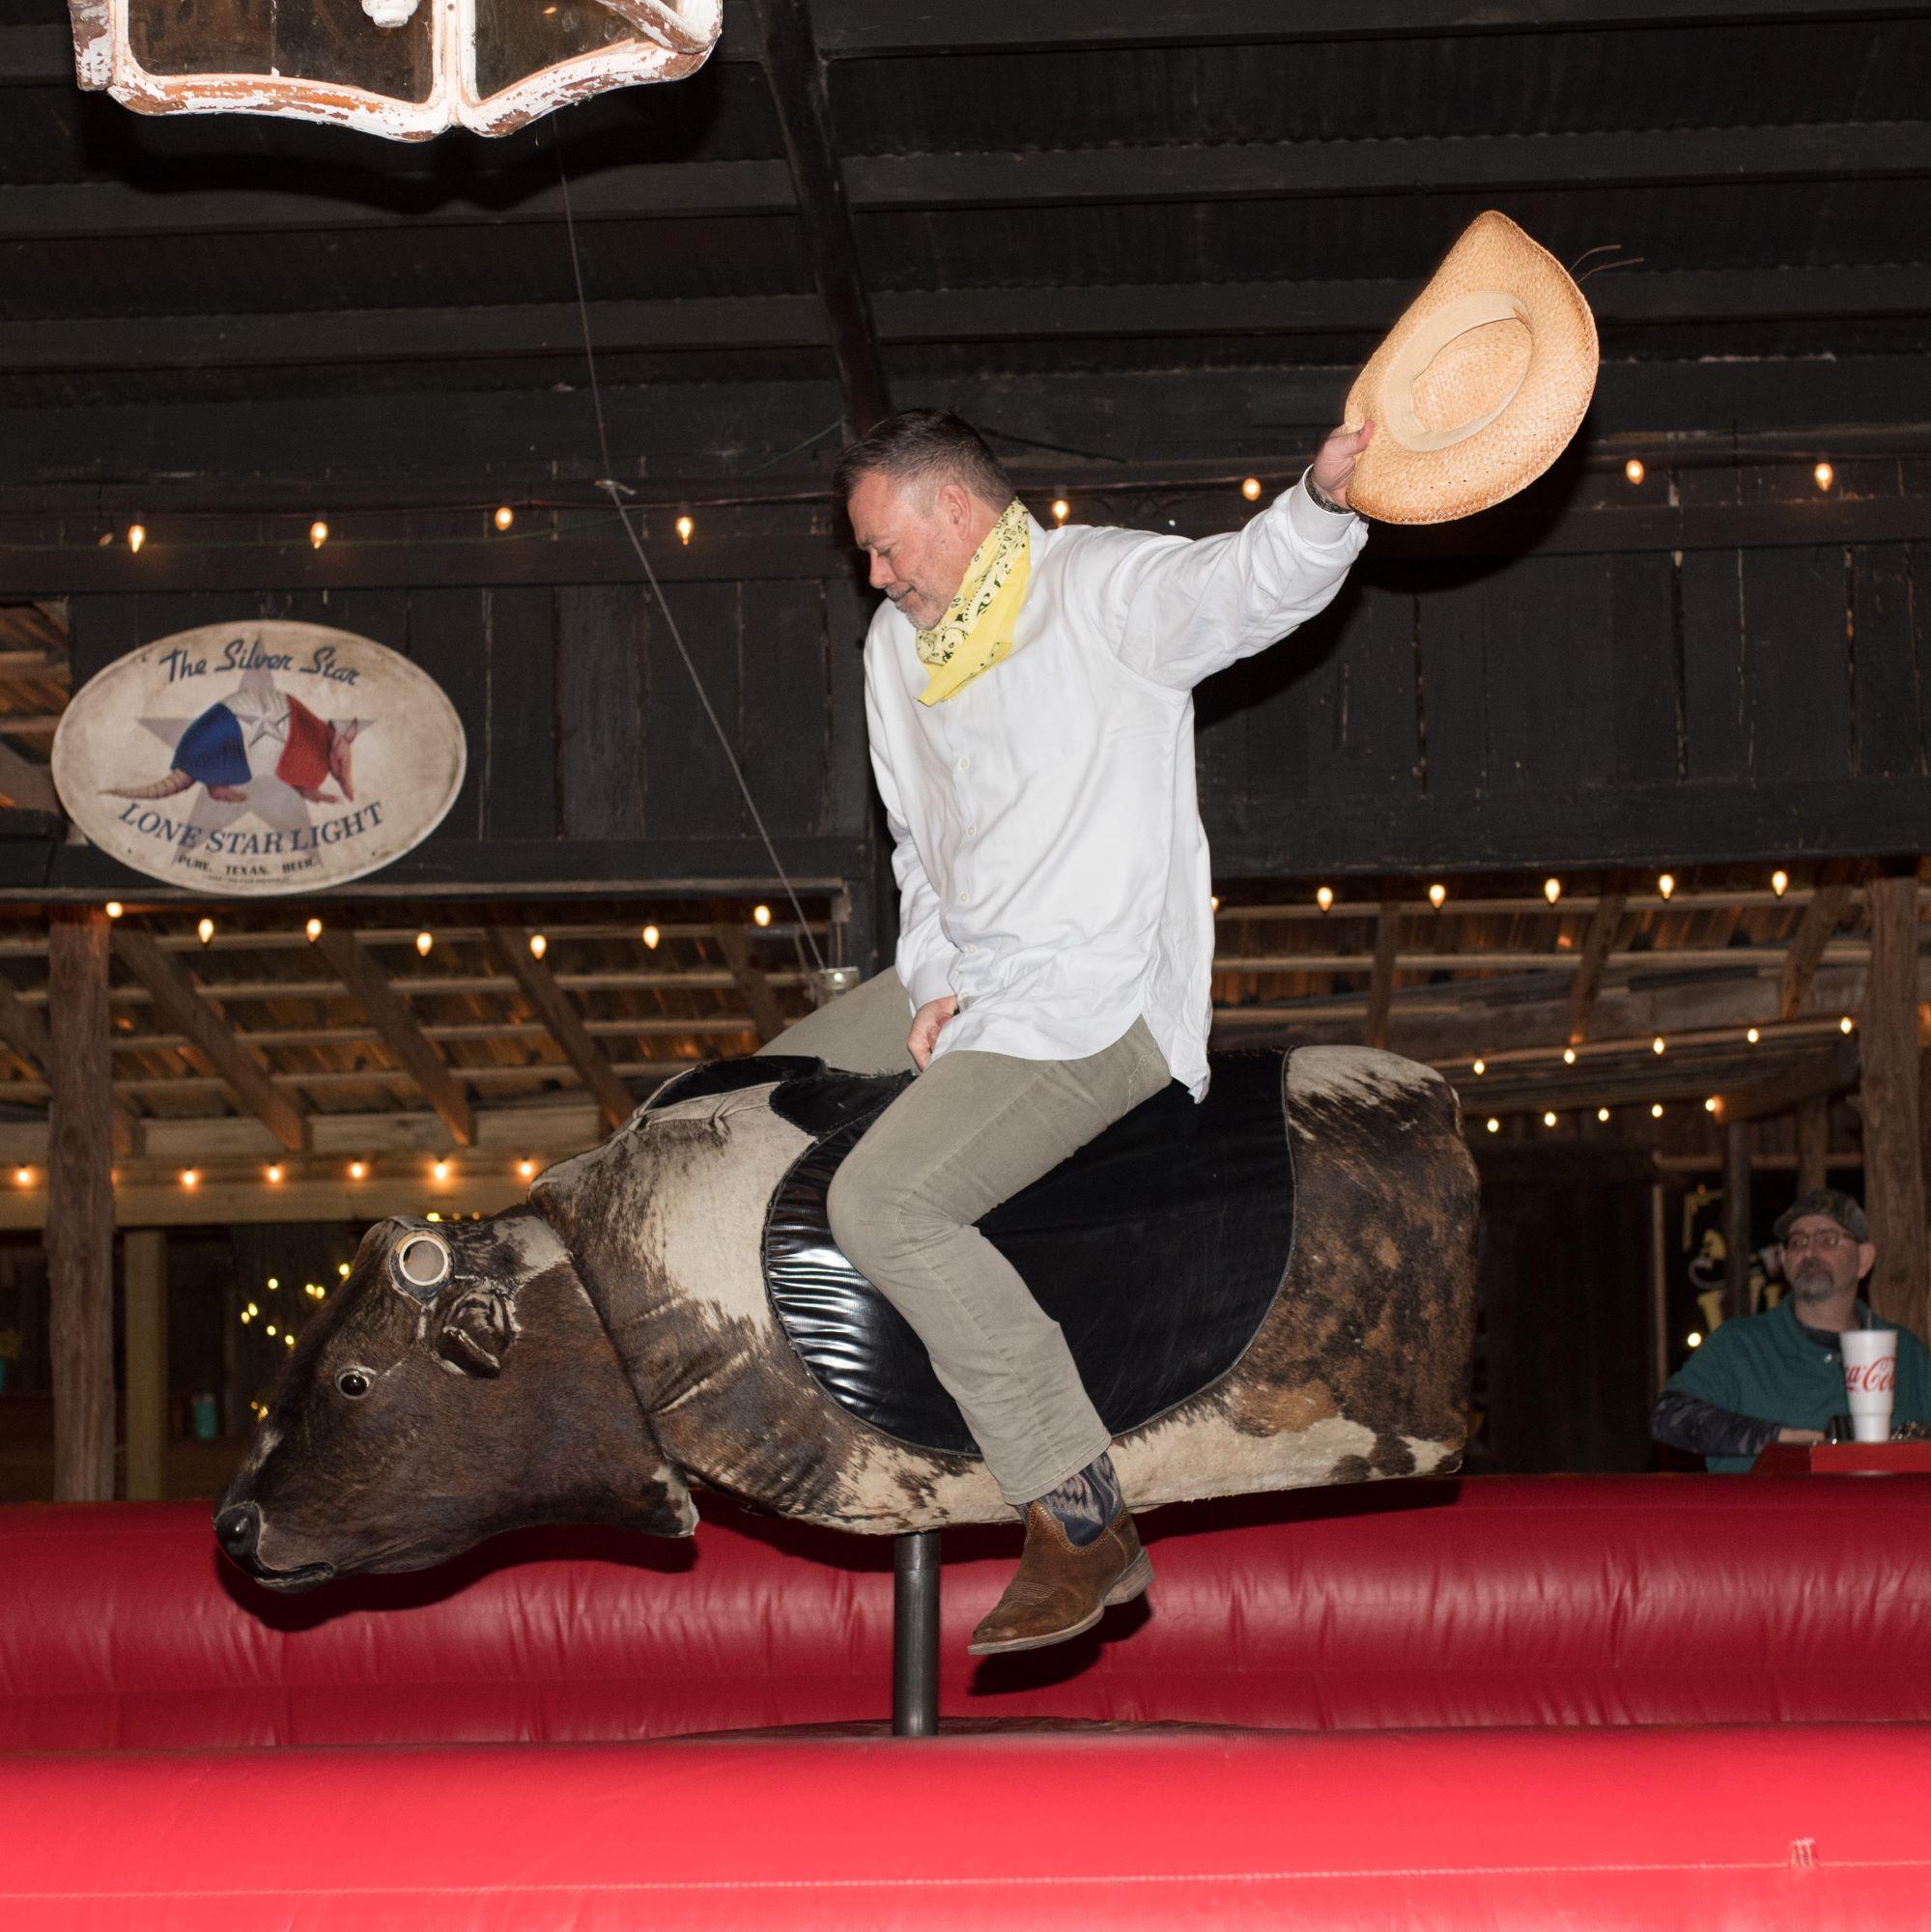 San Antonio Team Building Retreat Corporate Event Venue Mechanical Bull Ride